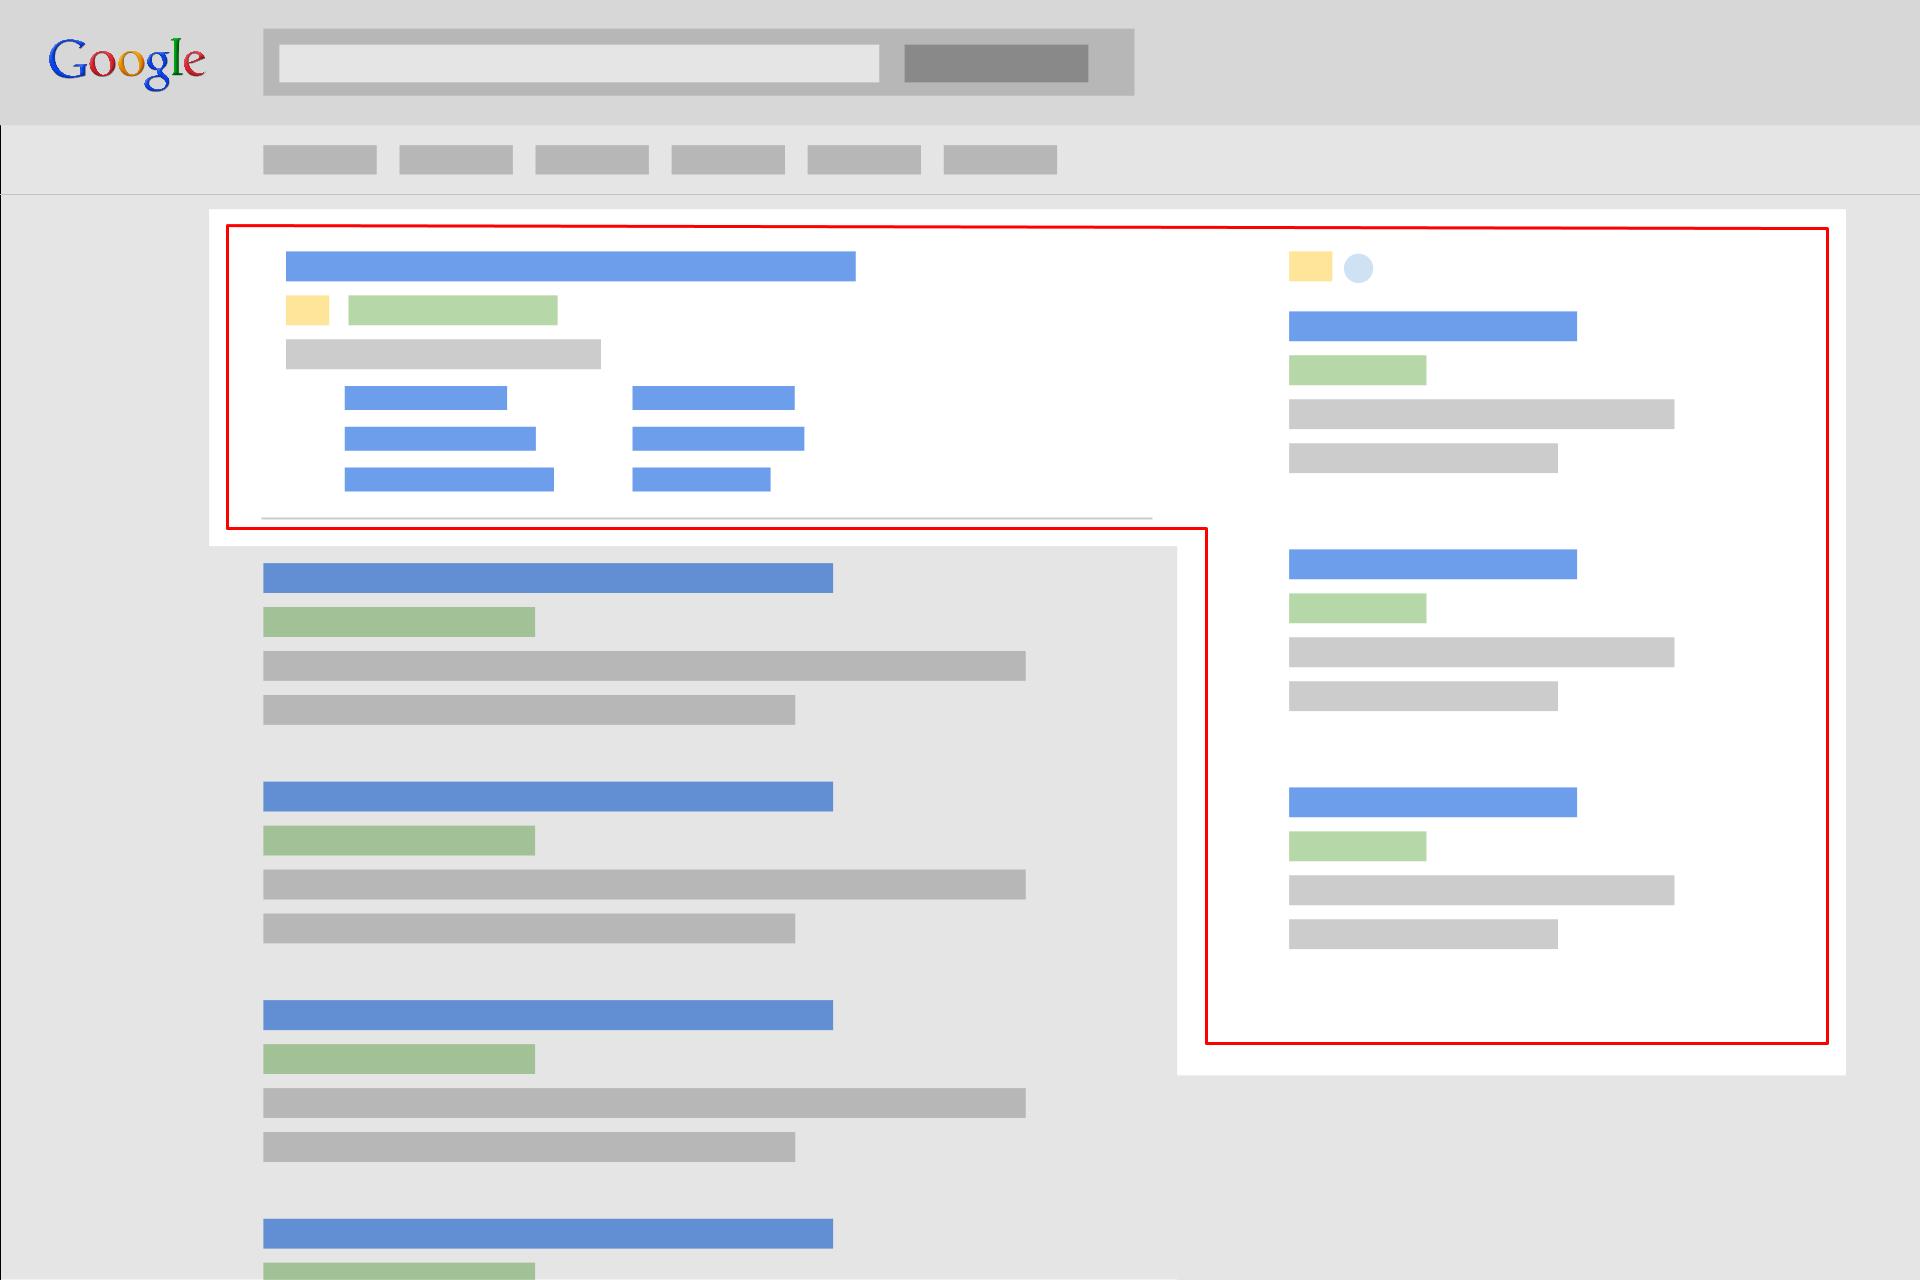 manas-medya-reklam-tasarim-ajansi-google-reklamlari Arama motoru pazarlaması sem search engine marketing arama motoru pazarlama